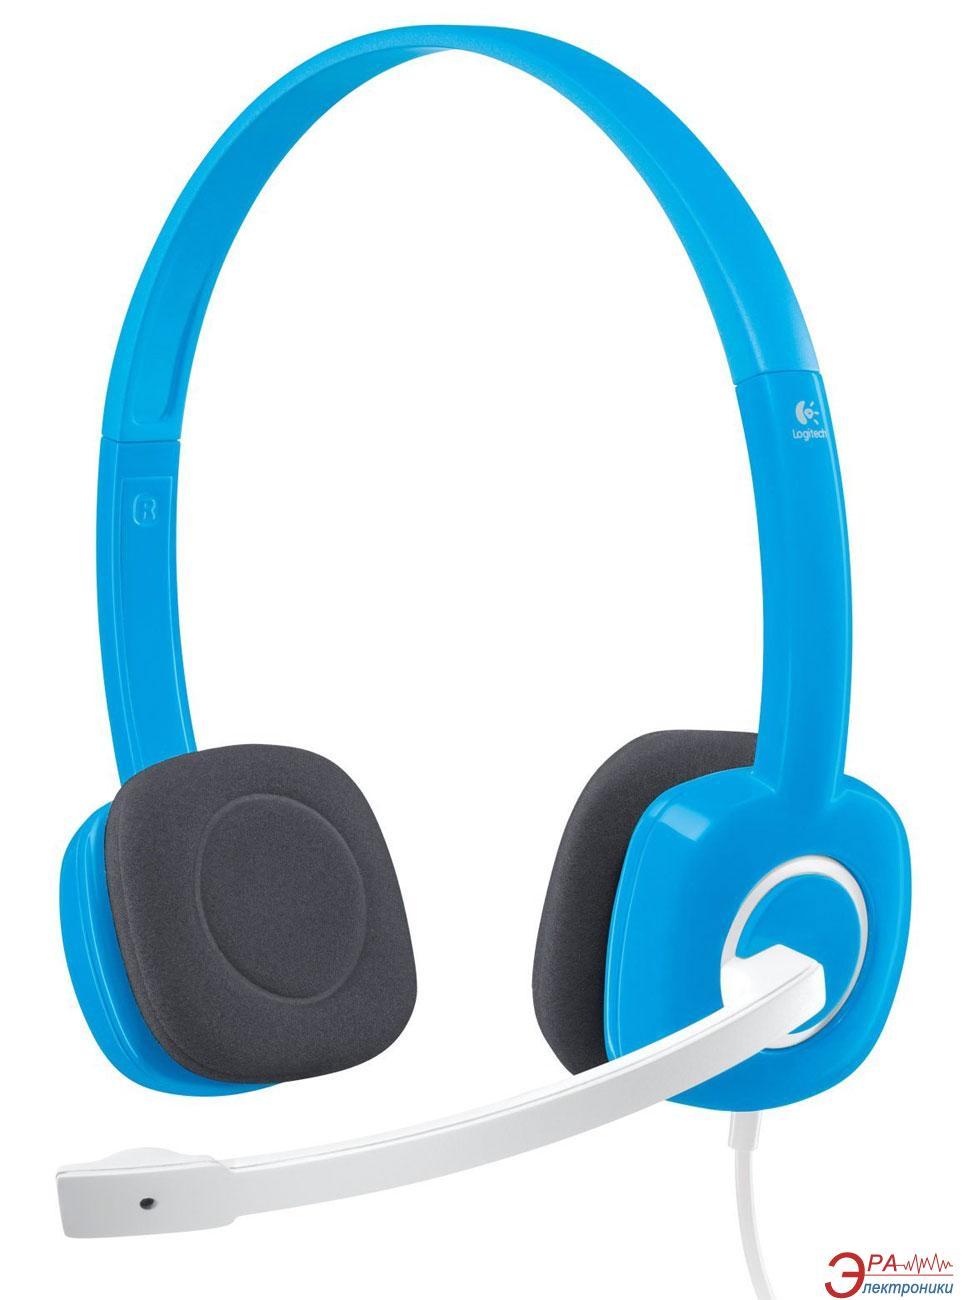 Гарнитура Logitech H150 Stereo Sky Blue (981-000368)